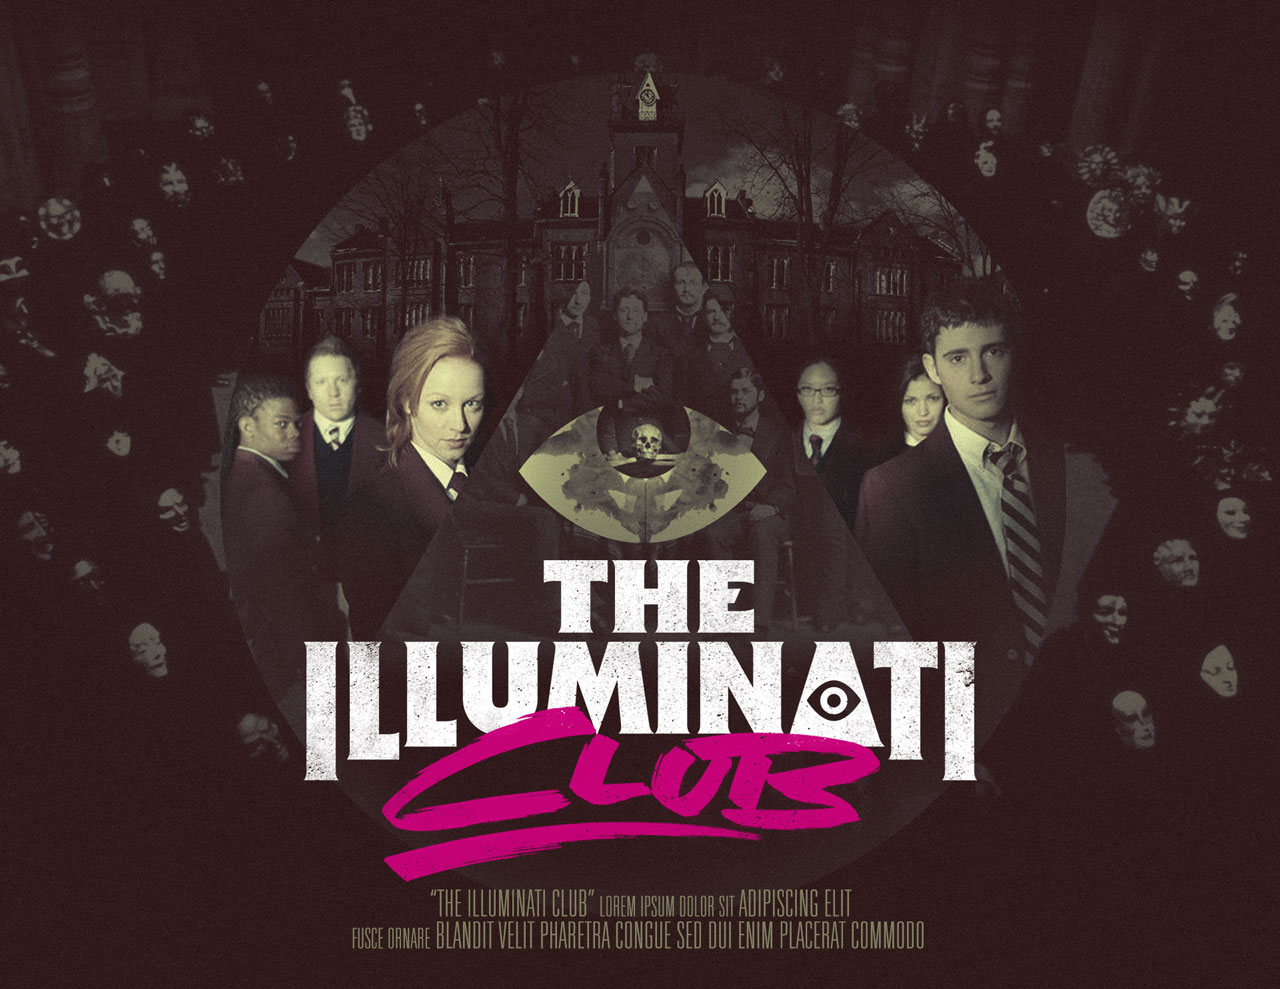 The Illuminati Club pitch deck